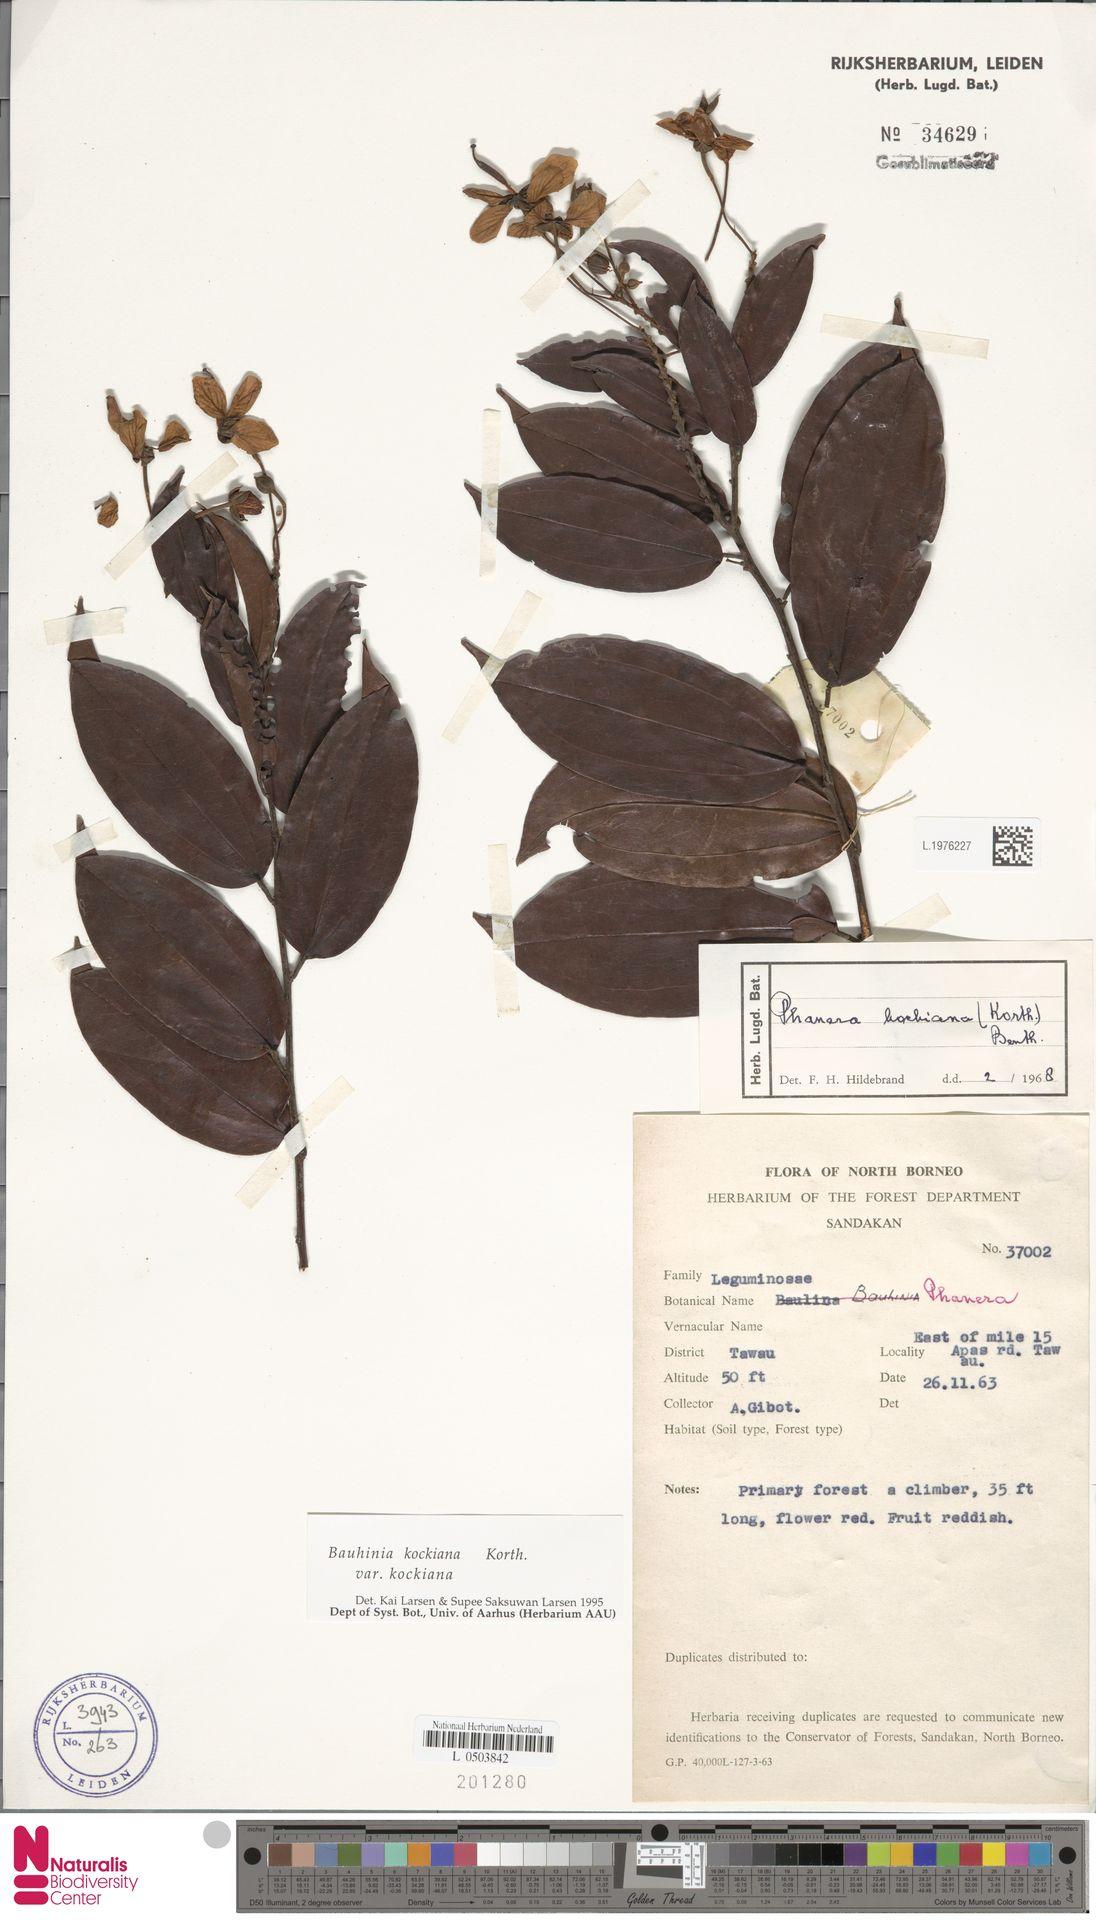 L.1976227 | Bauhinia kockiana var. kockiana